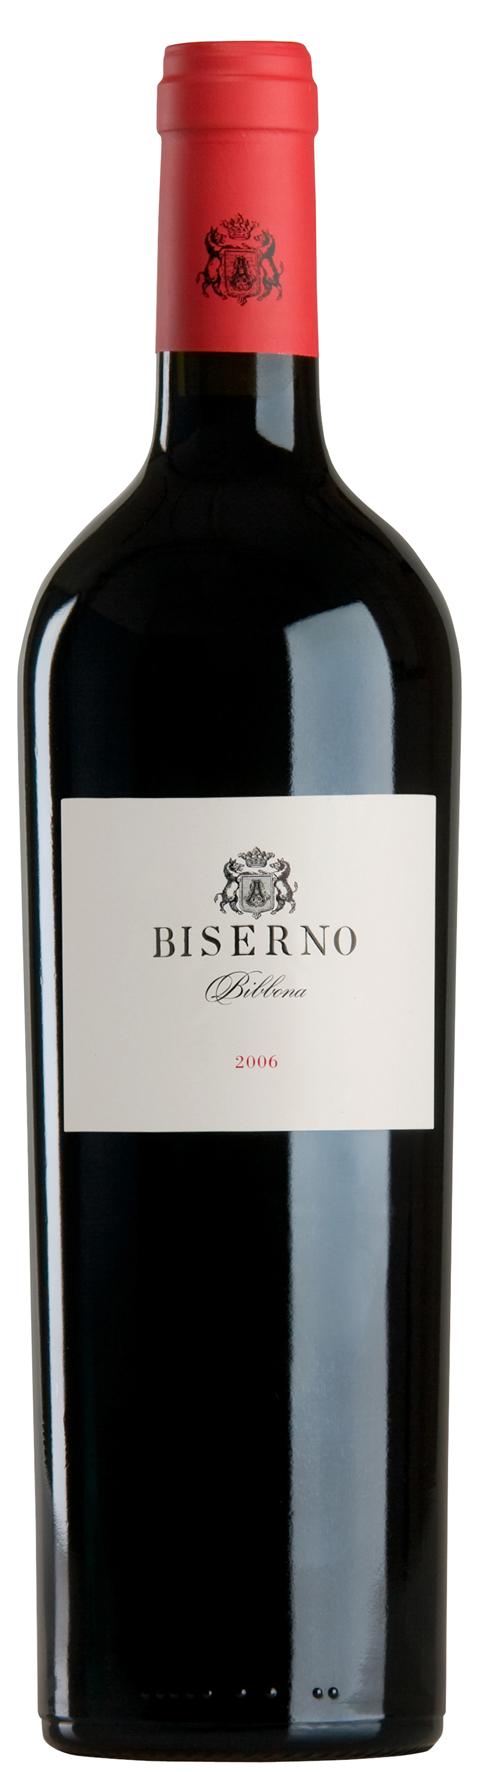 2010 Biserno Toscana IGT TENUTA DI BISERNO Magnum